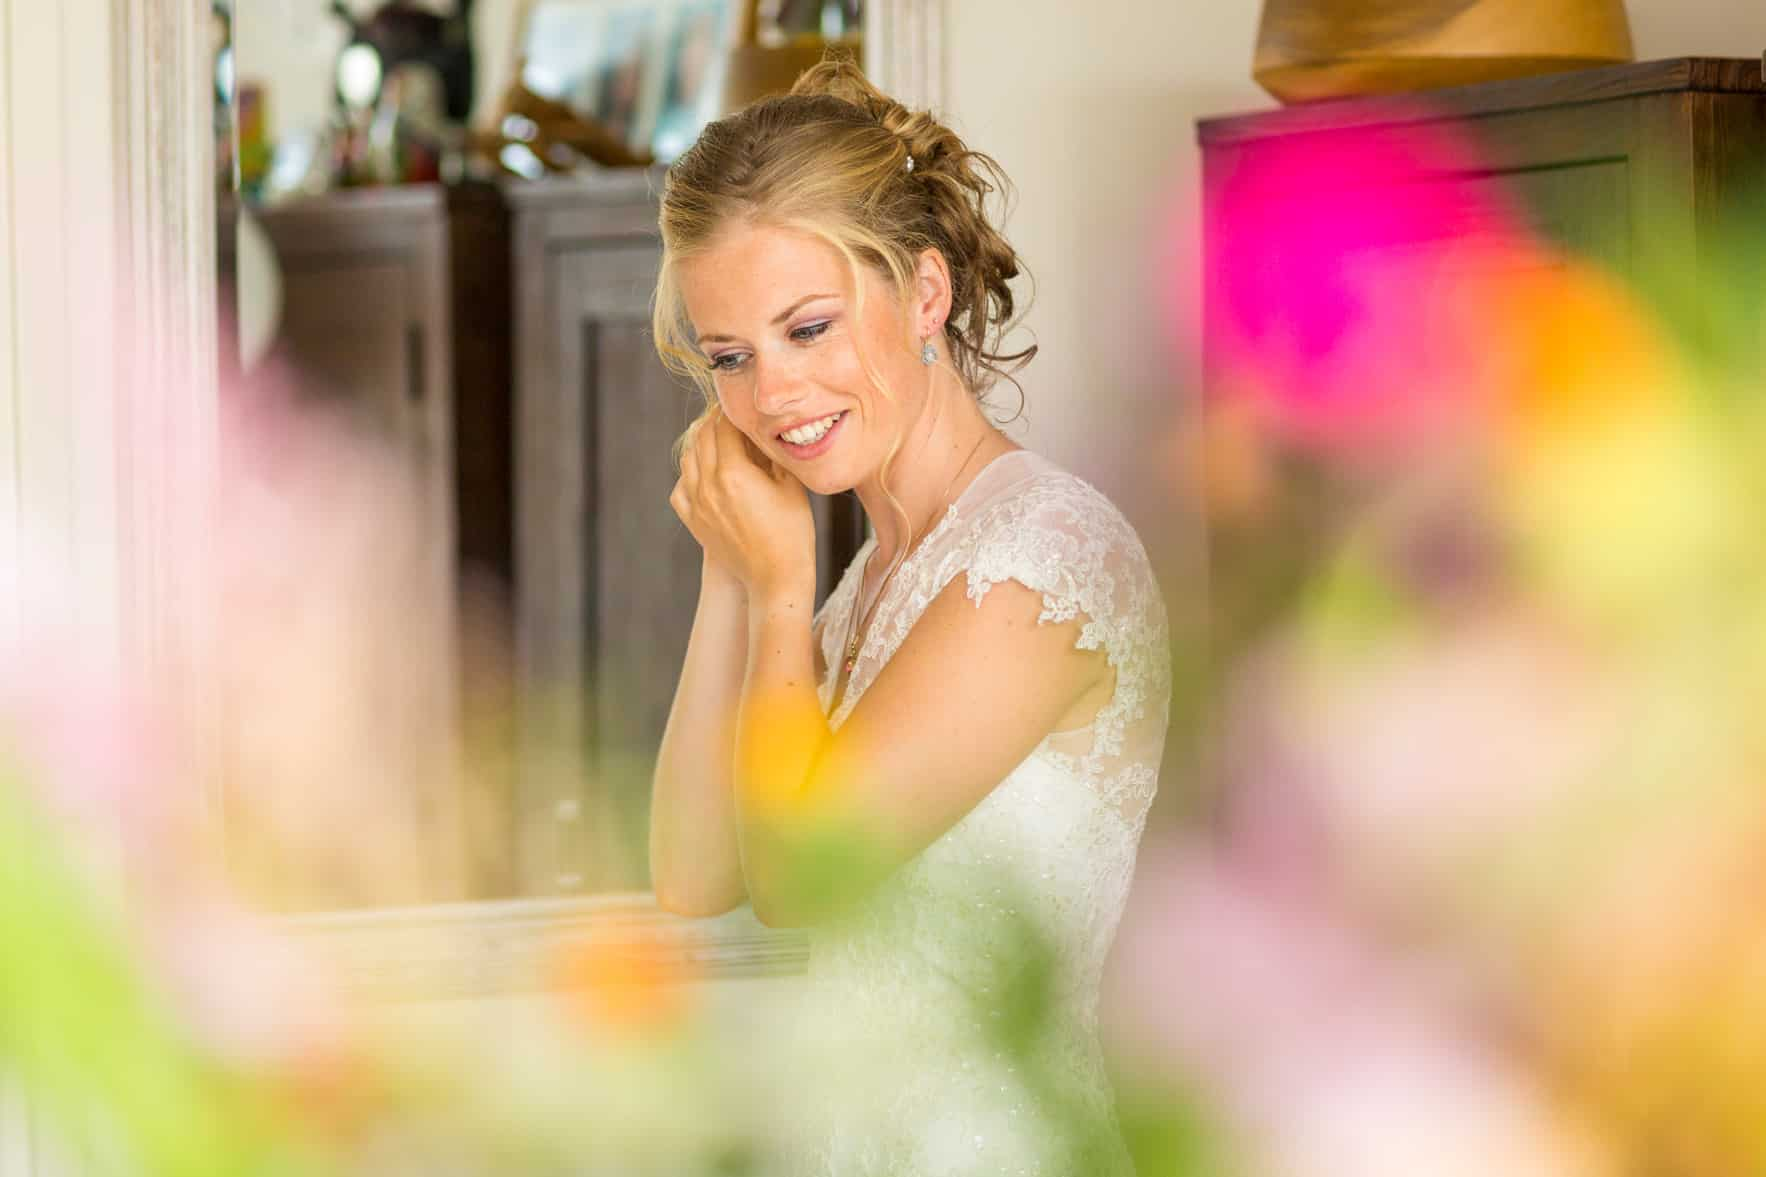 fotograaf Bussum trouwen bruidsfoto